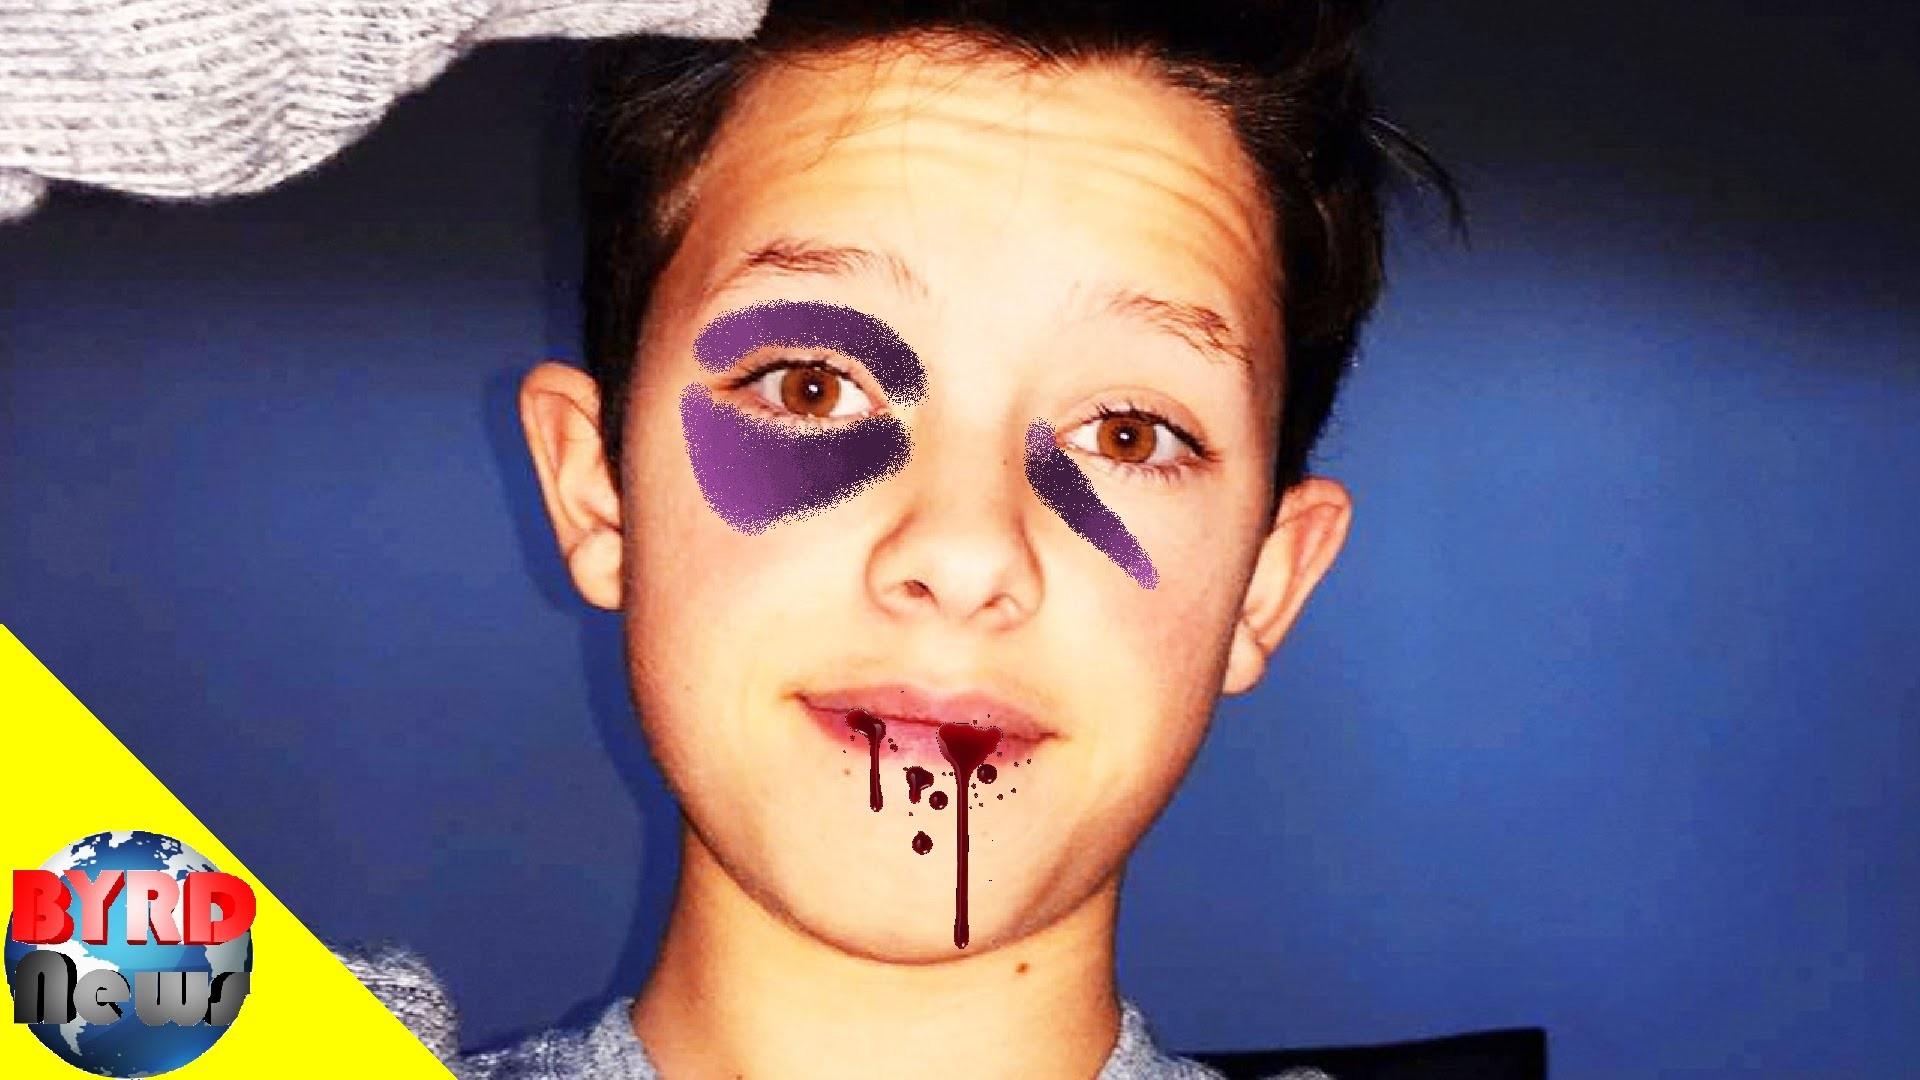 BYRD News: Jacob Sartorius attacked by girl / FouseyTube vs Joey Salads –  YouTube